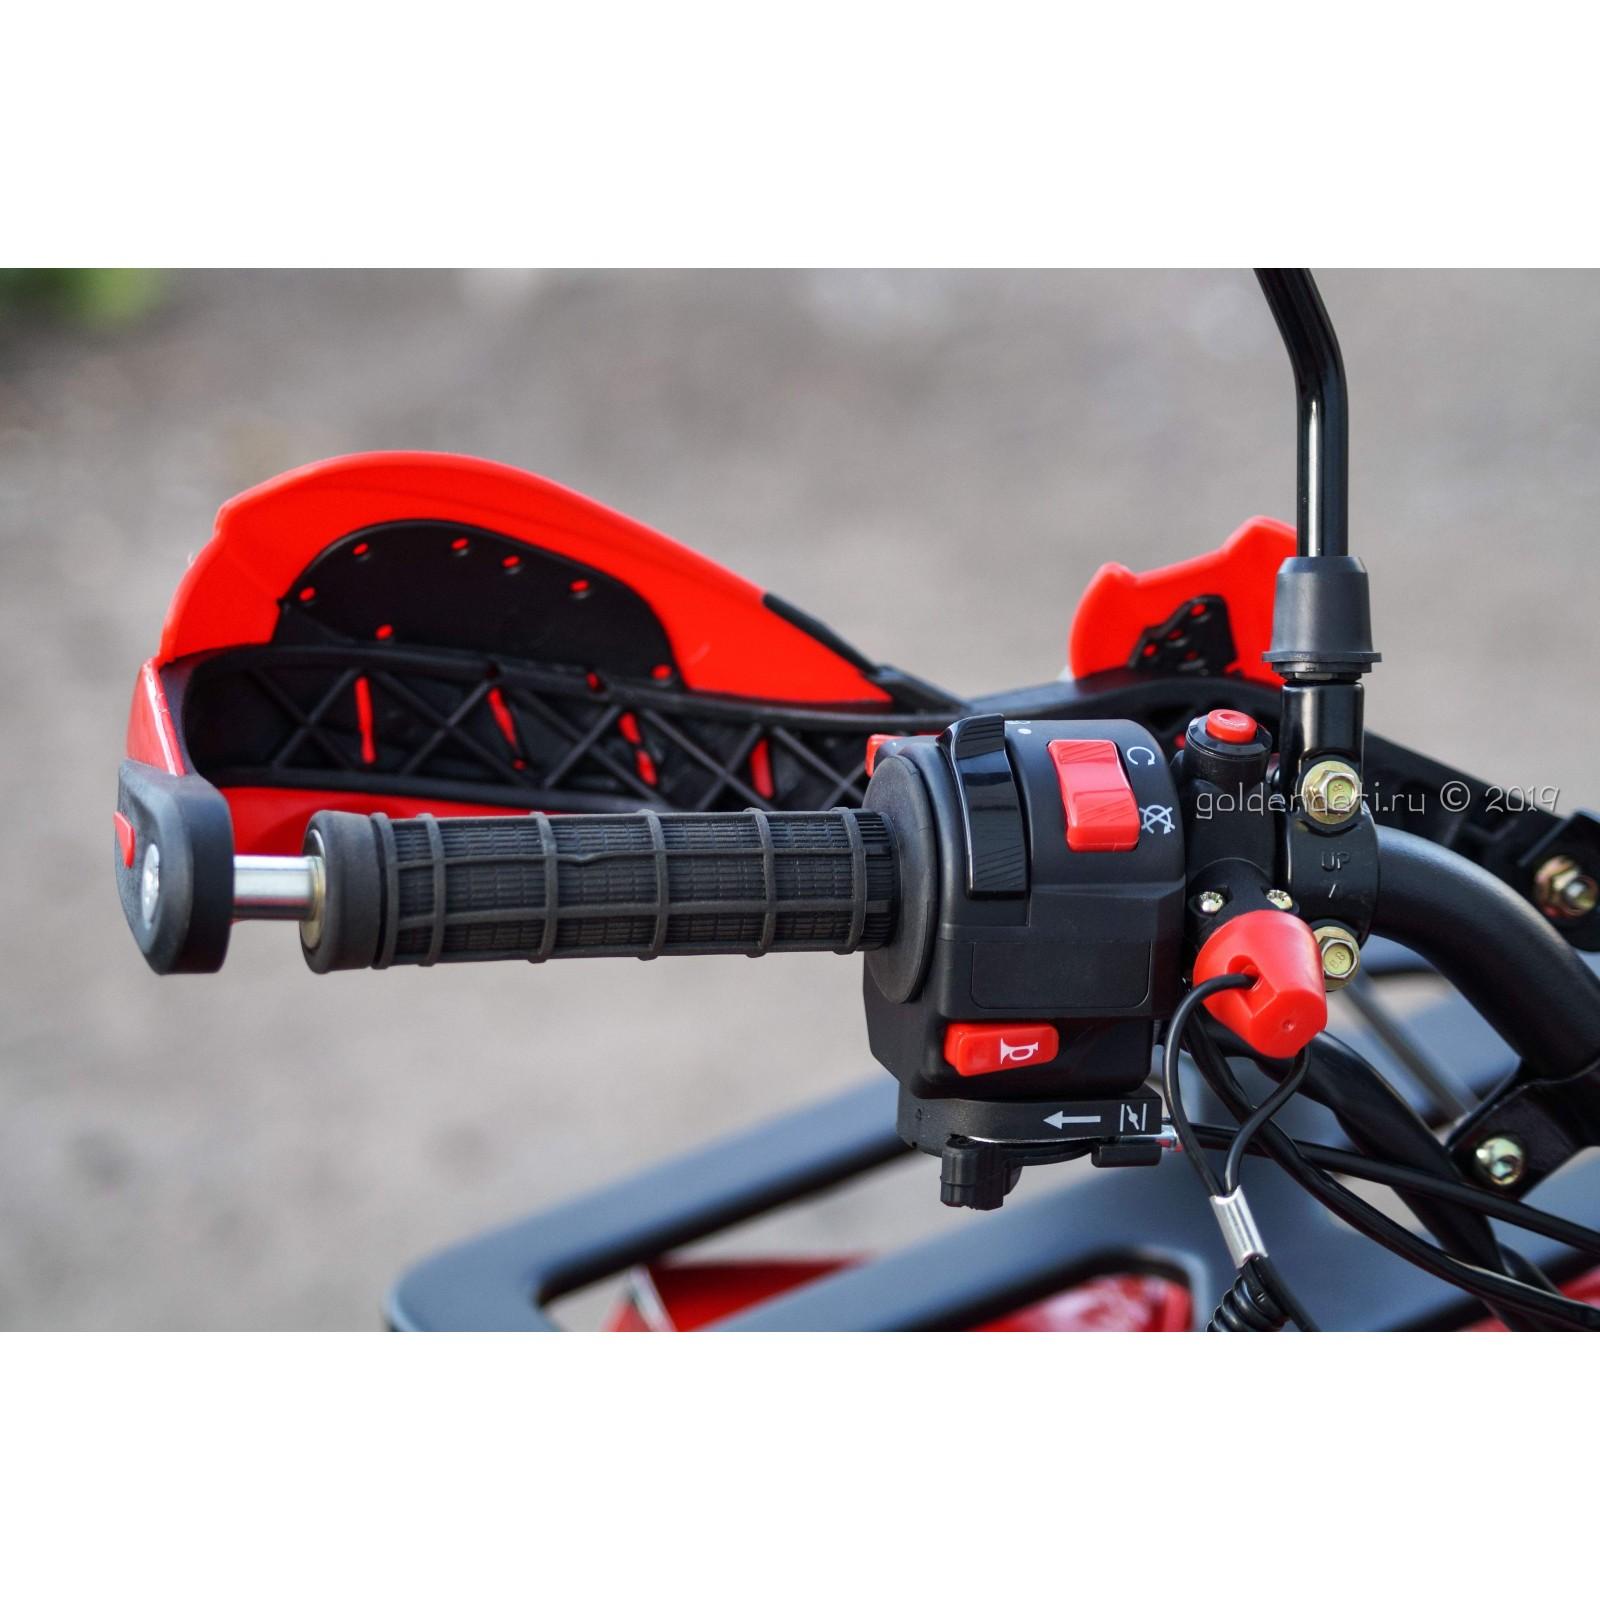 Квадроцикл Stalker-125 COMMANDER LUX (2020)